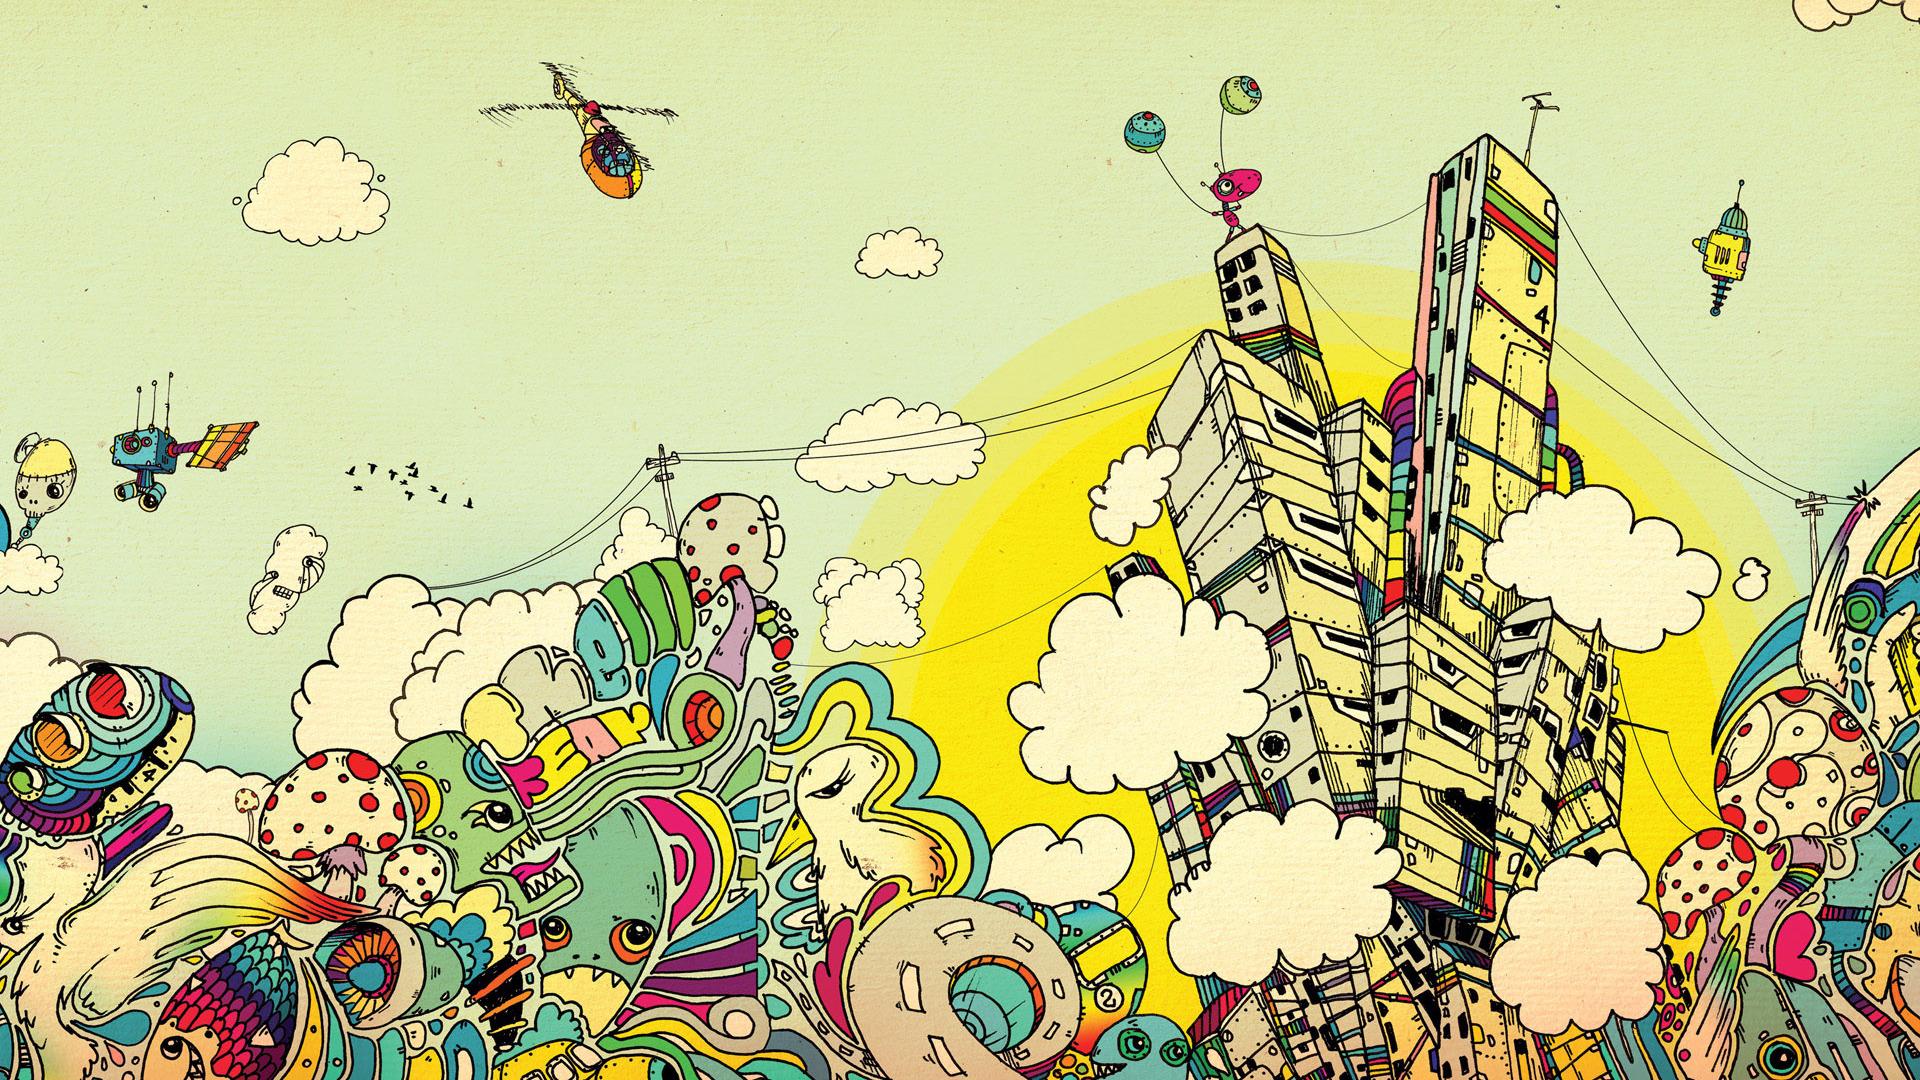 Drawn background desktop Colorful HD Landscape Net wallpaper